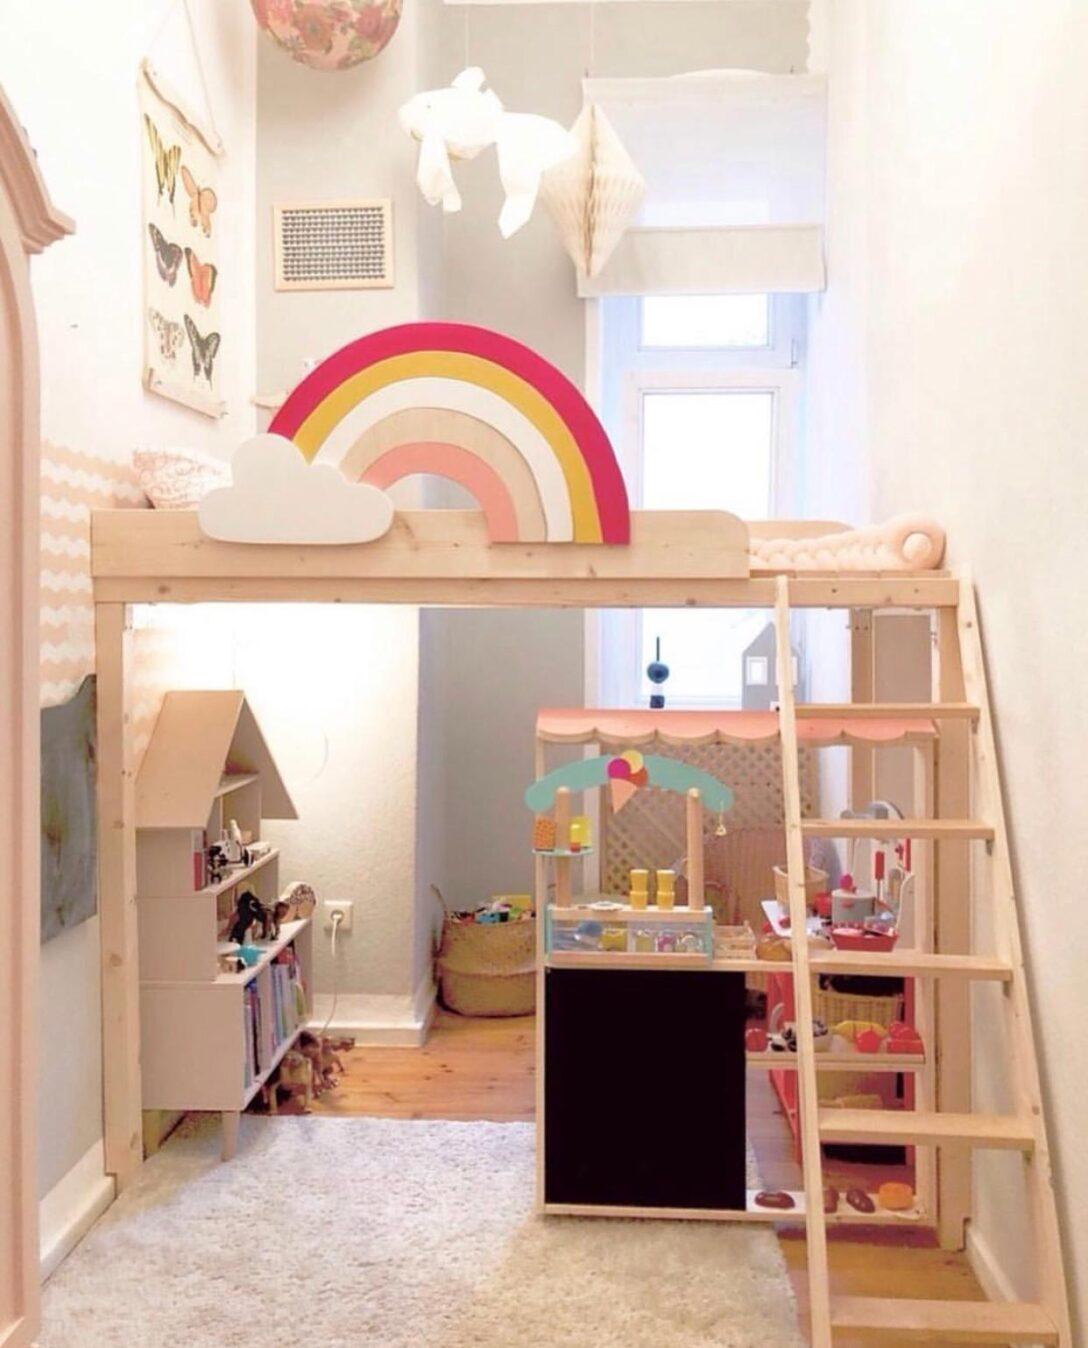 Large Size of Kinderzimmer Hochbett Regenbogen Diy Altbau Be Regal Weiß Regale Sofa Kinderzimmer Kinderzimmer Hochbett